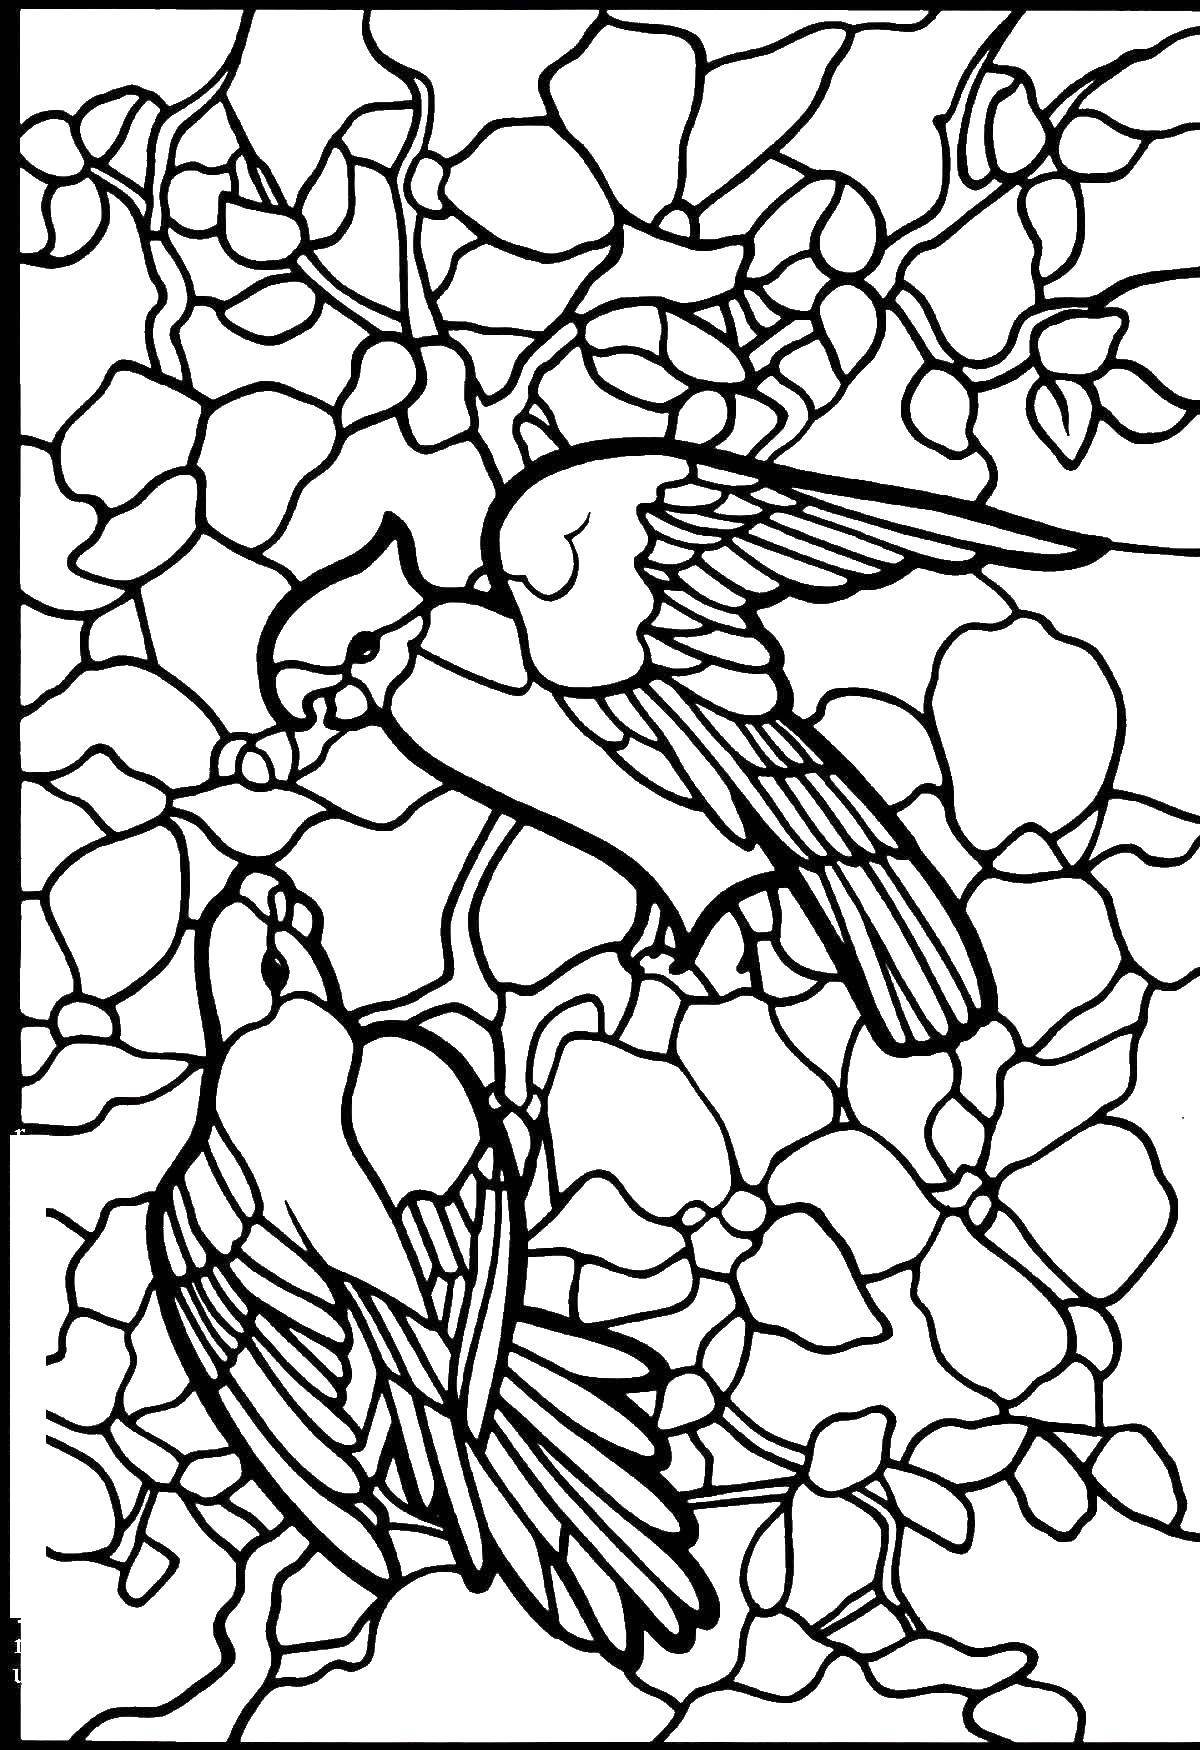 Раскраски попугаи, Раскраска Попугаи на дереве витражи.